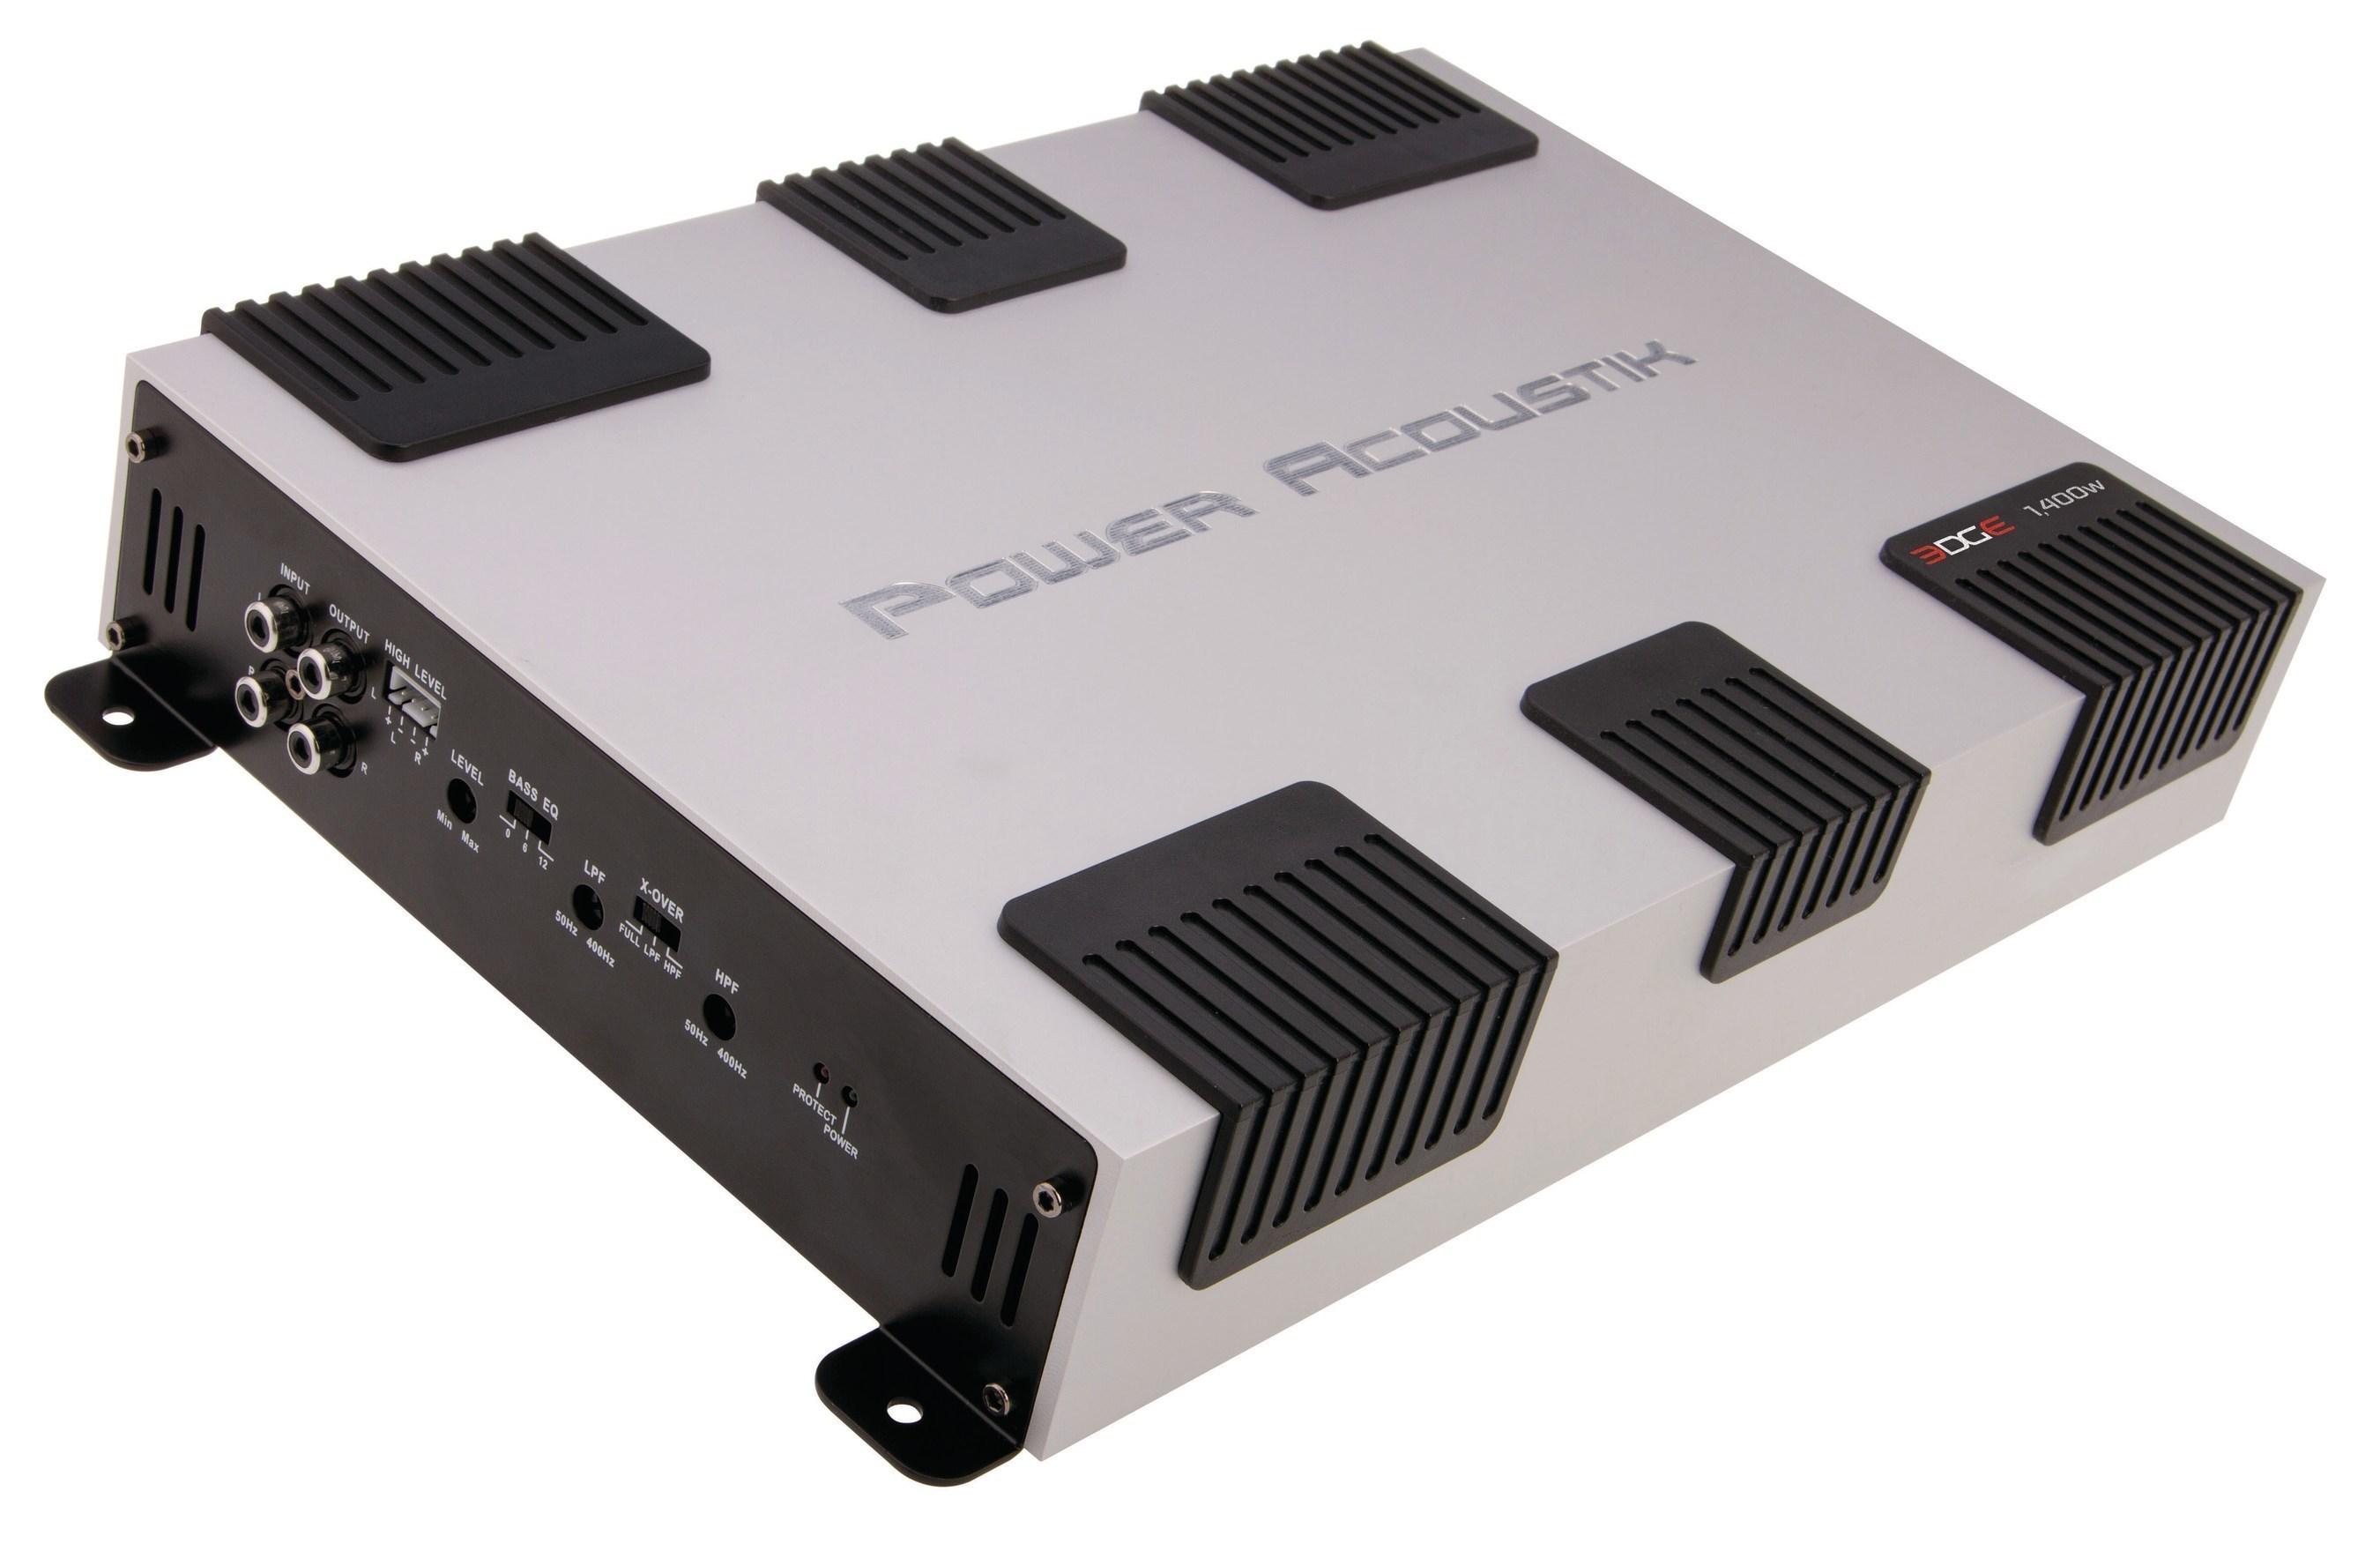 Power Acoustik Edge Amplifiers Will Be Showcased At CES 2016 Under The Epsilon Electronics Inc